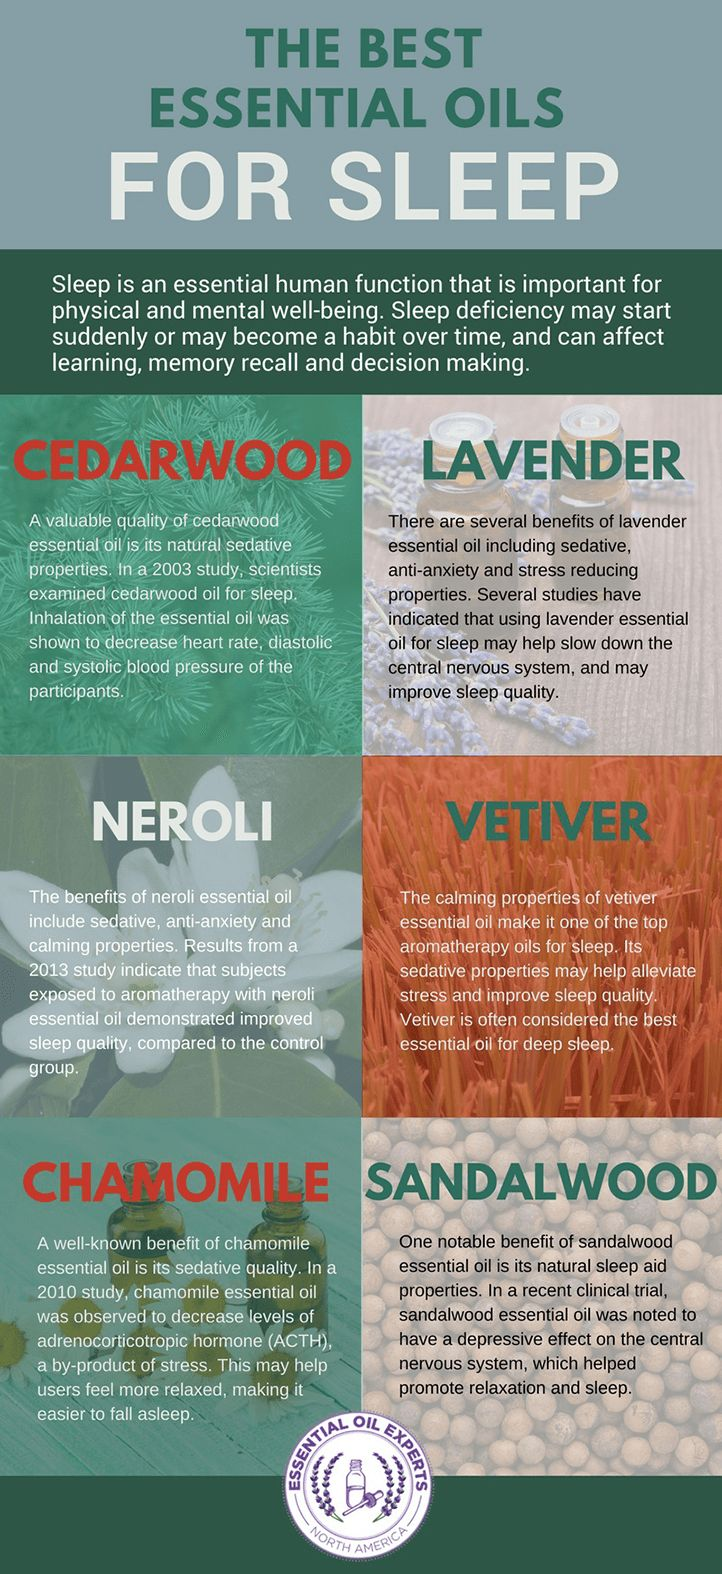 essential oils for sleep, cedarwood essential oil for sleep